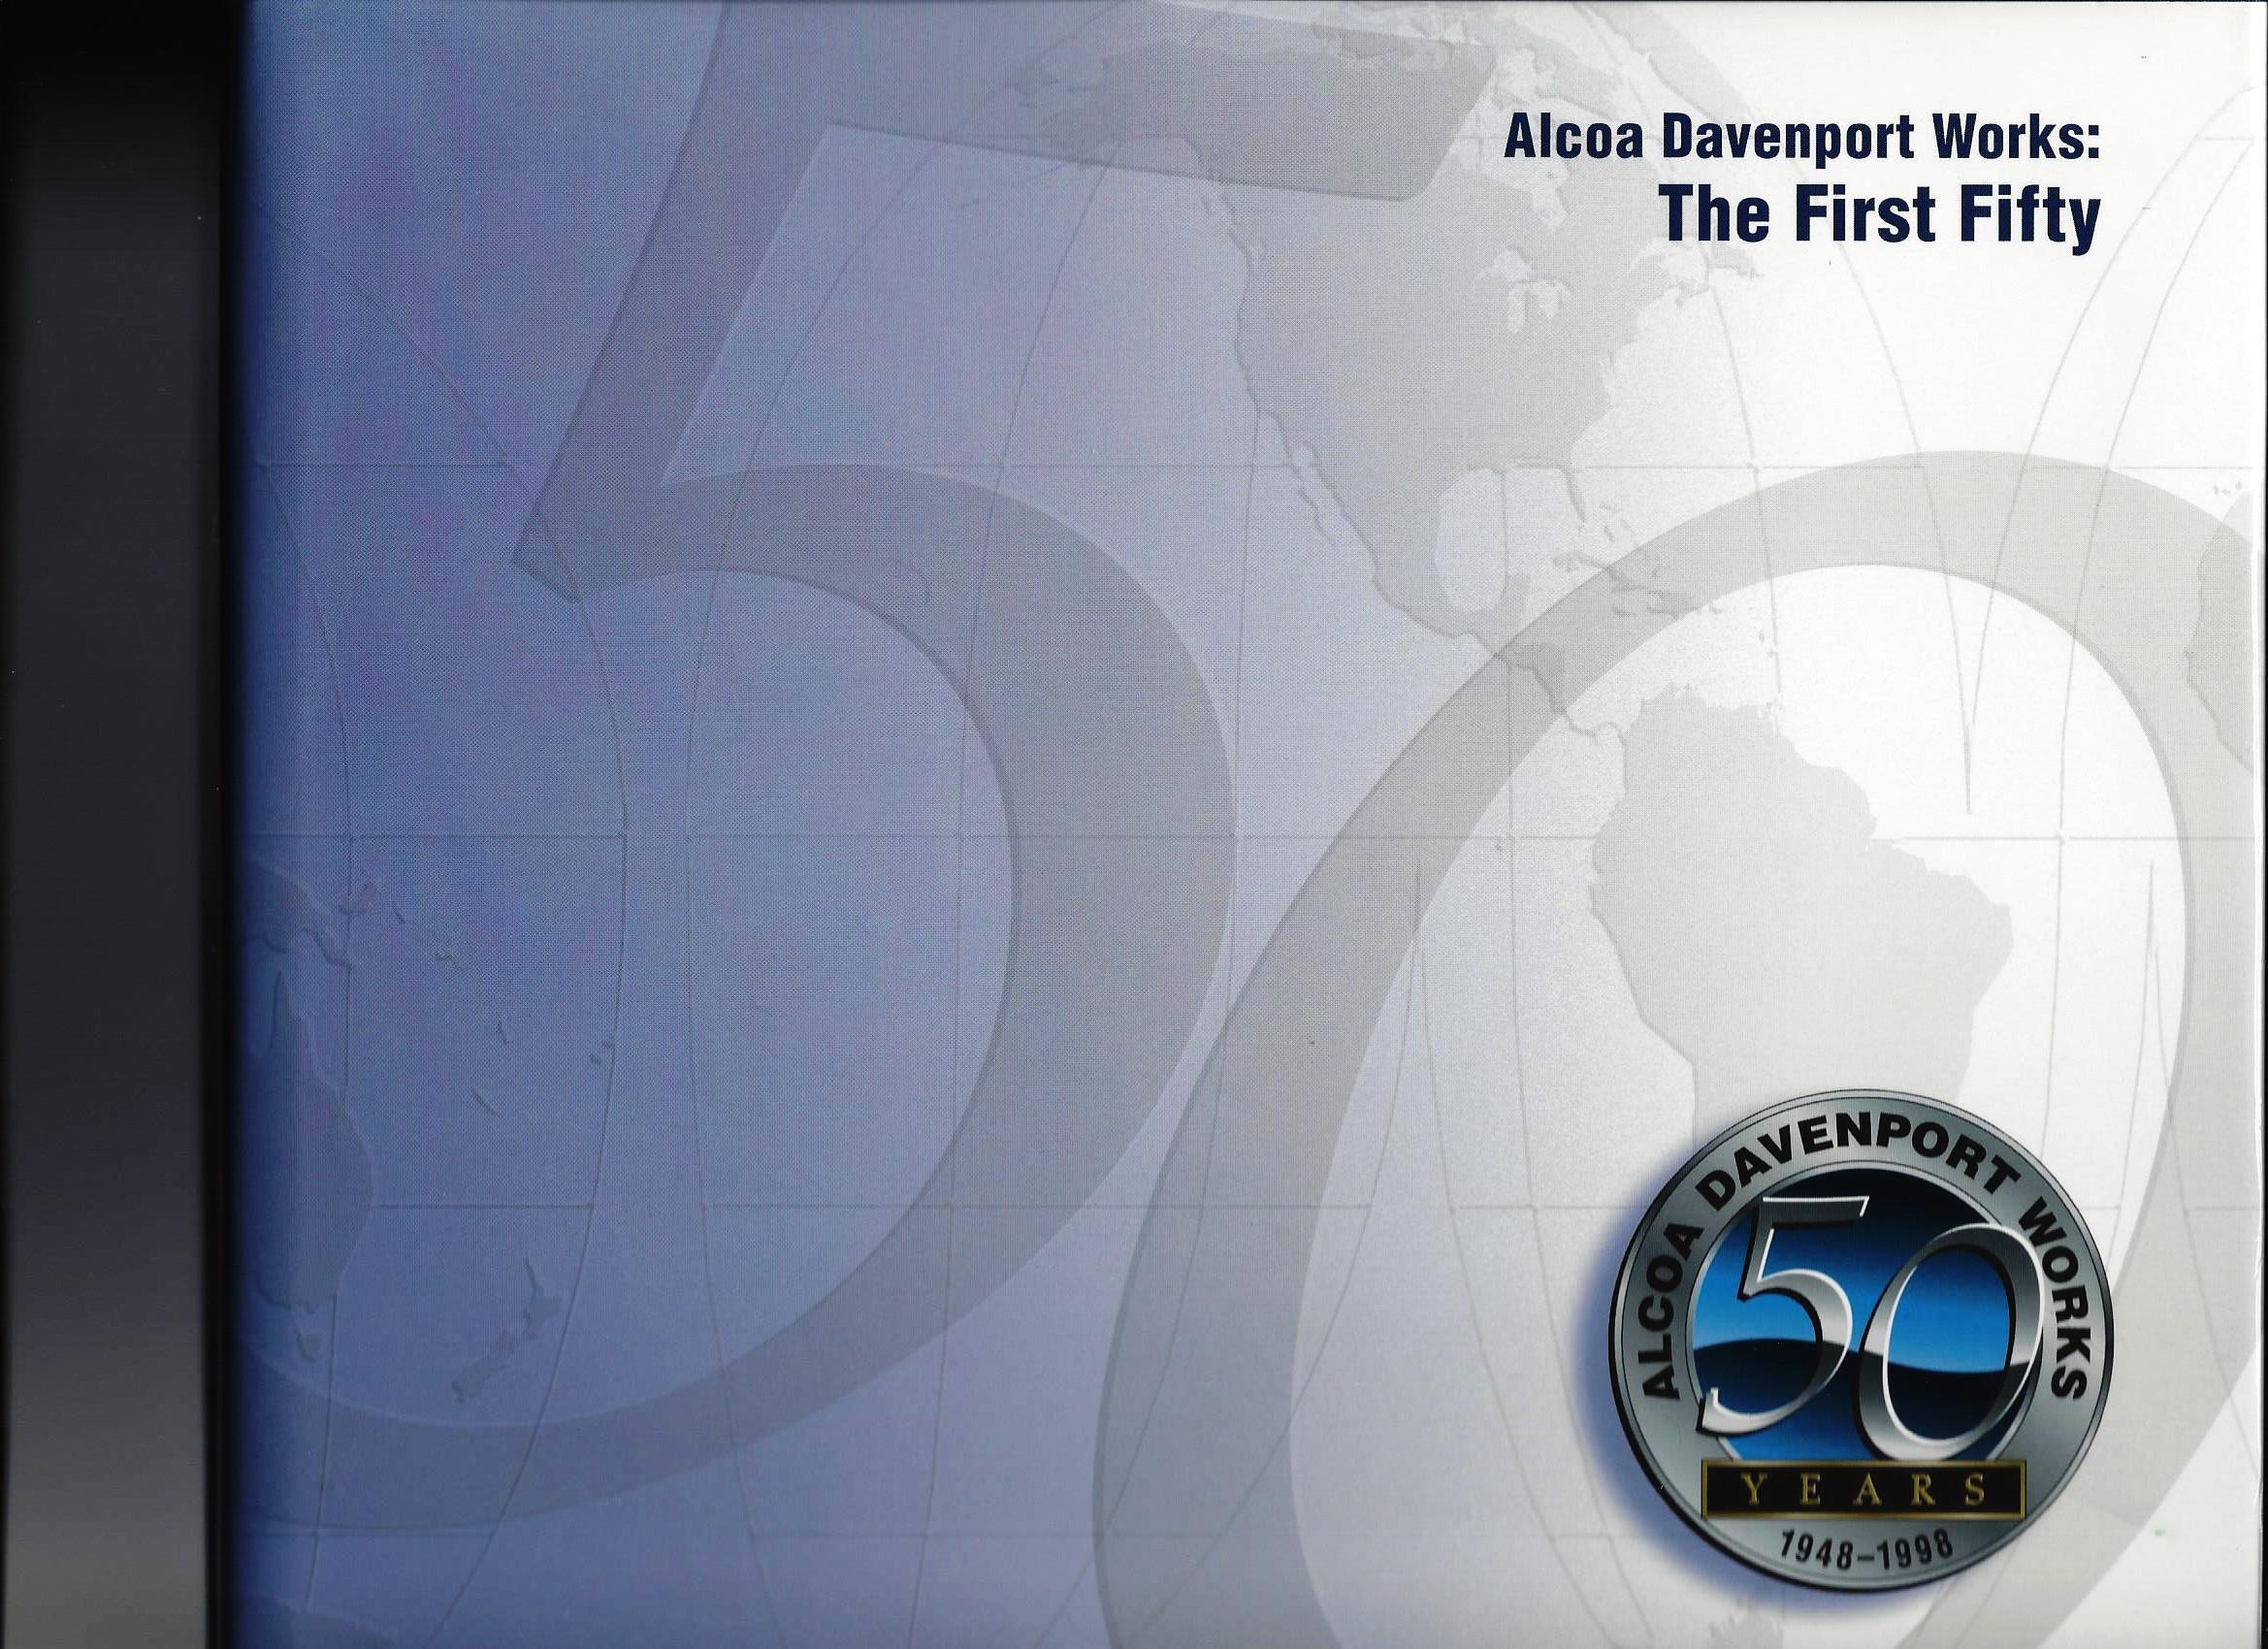 Davenport Alcoa Works